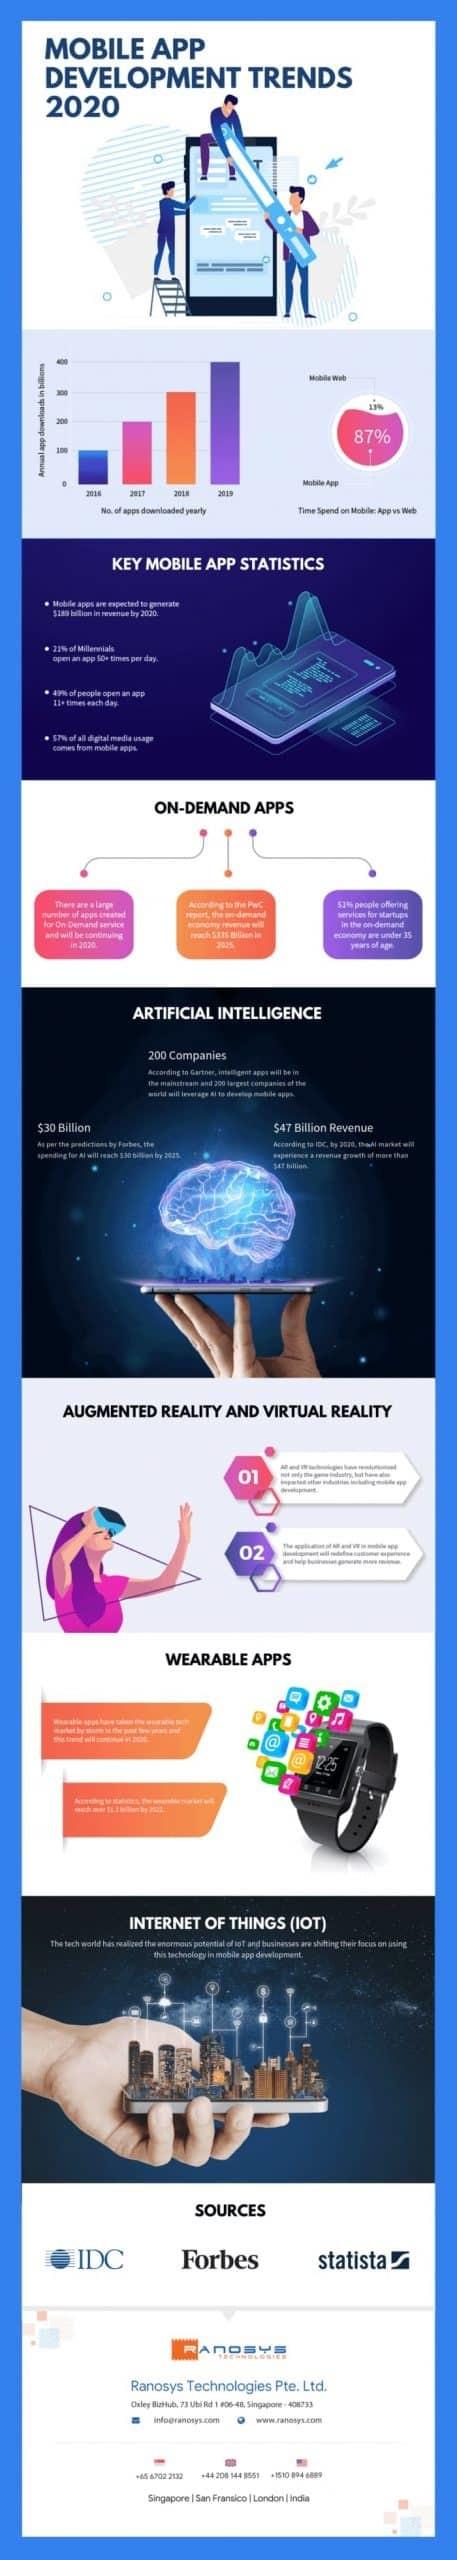 infografia desarrollo de apps 2020